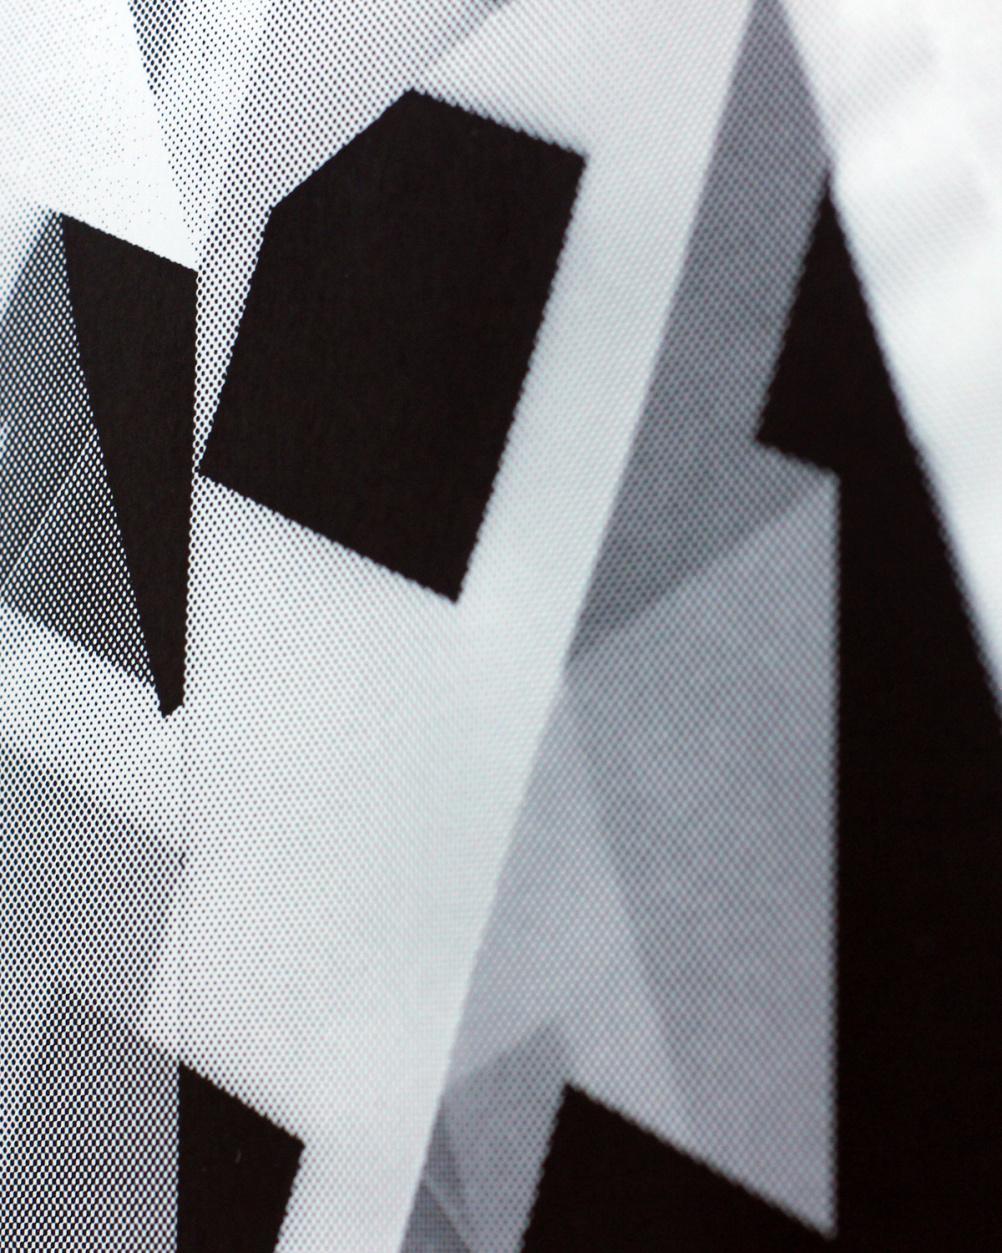 Helvetica Trace by Sarah Milton